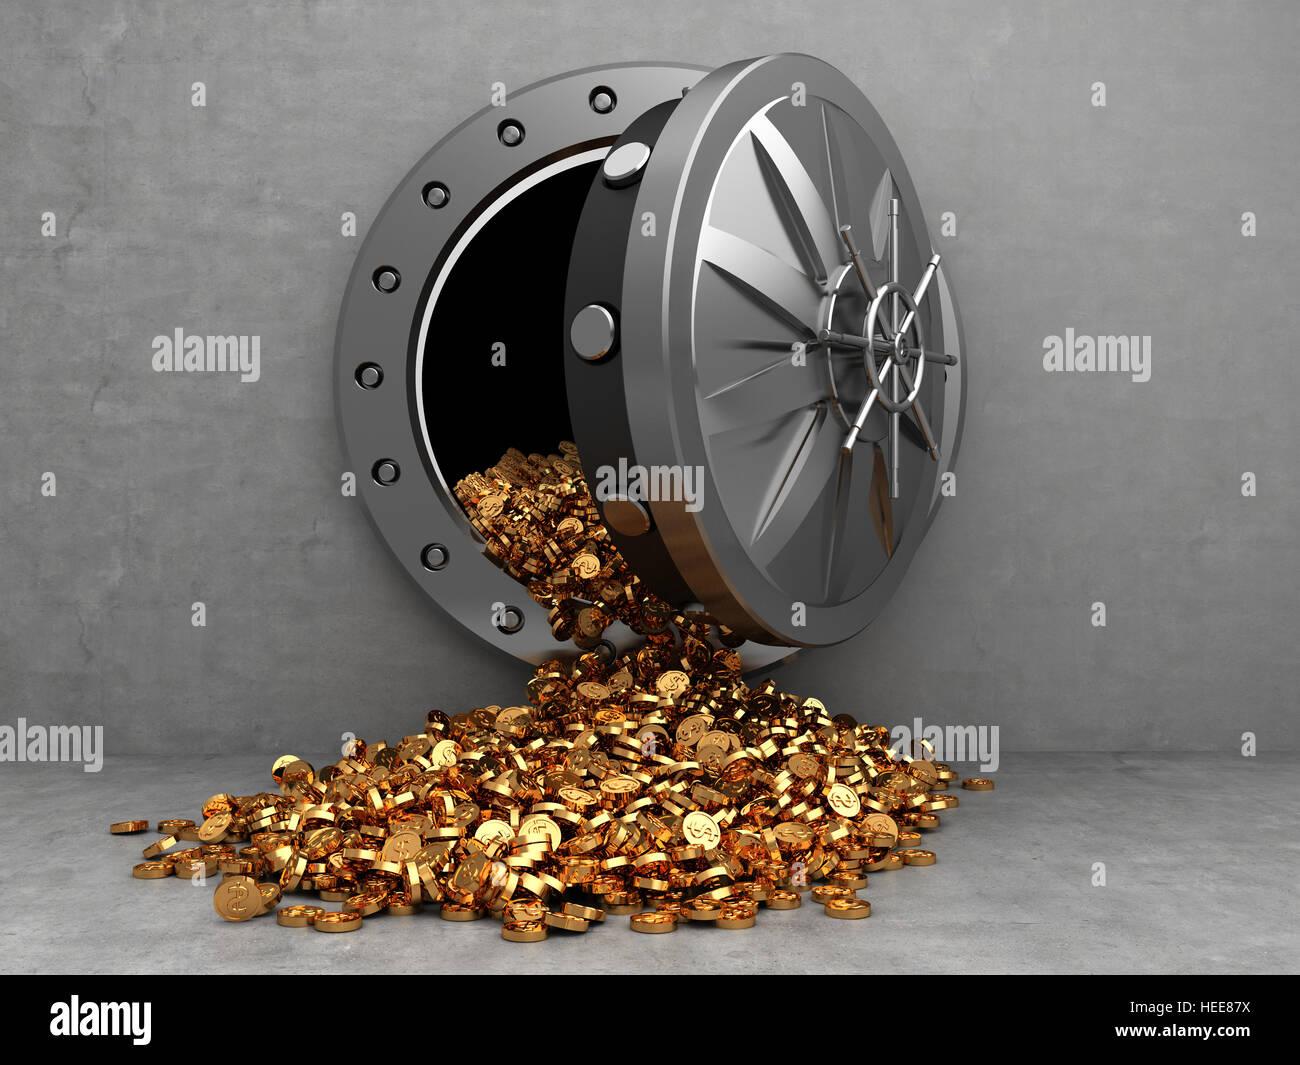 3d illustration of opened vault door and golden coins - Stock Image